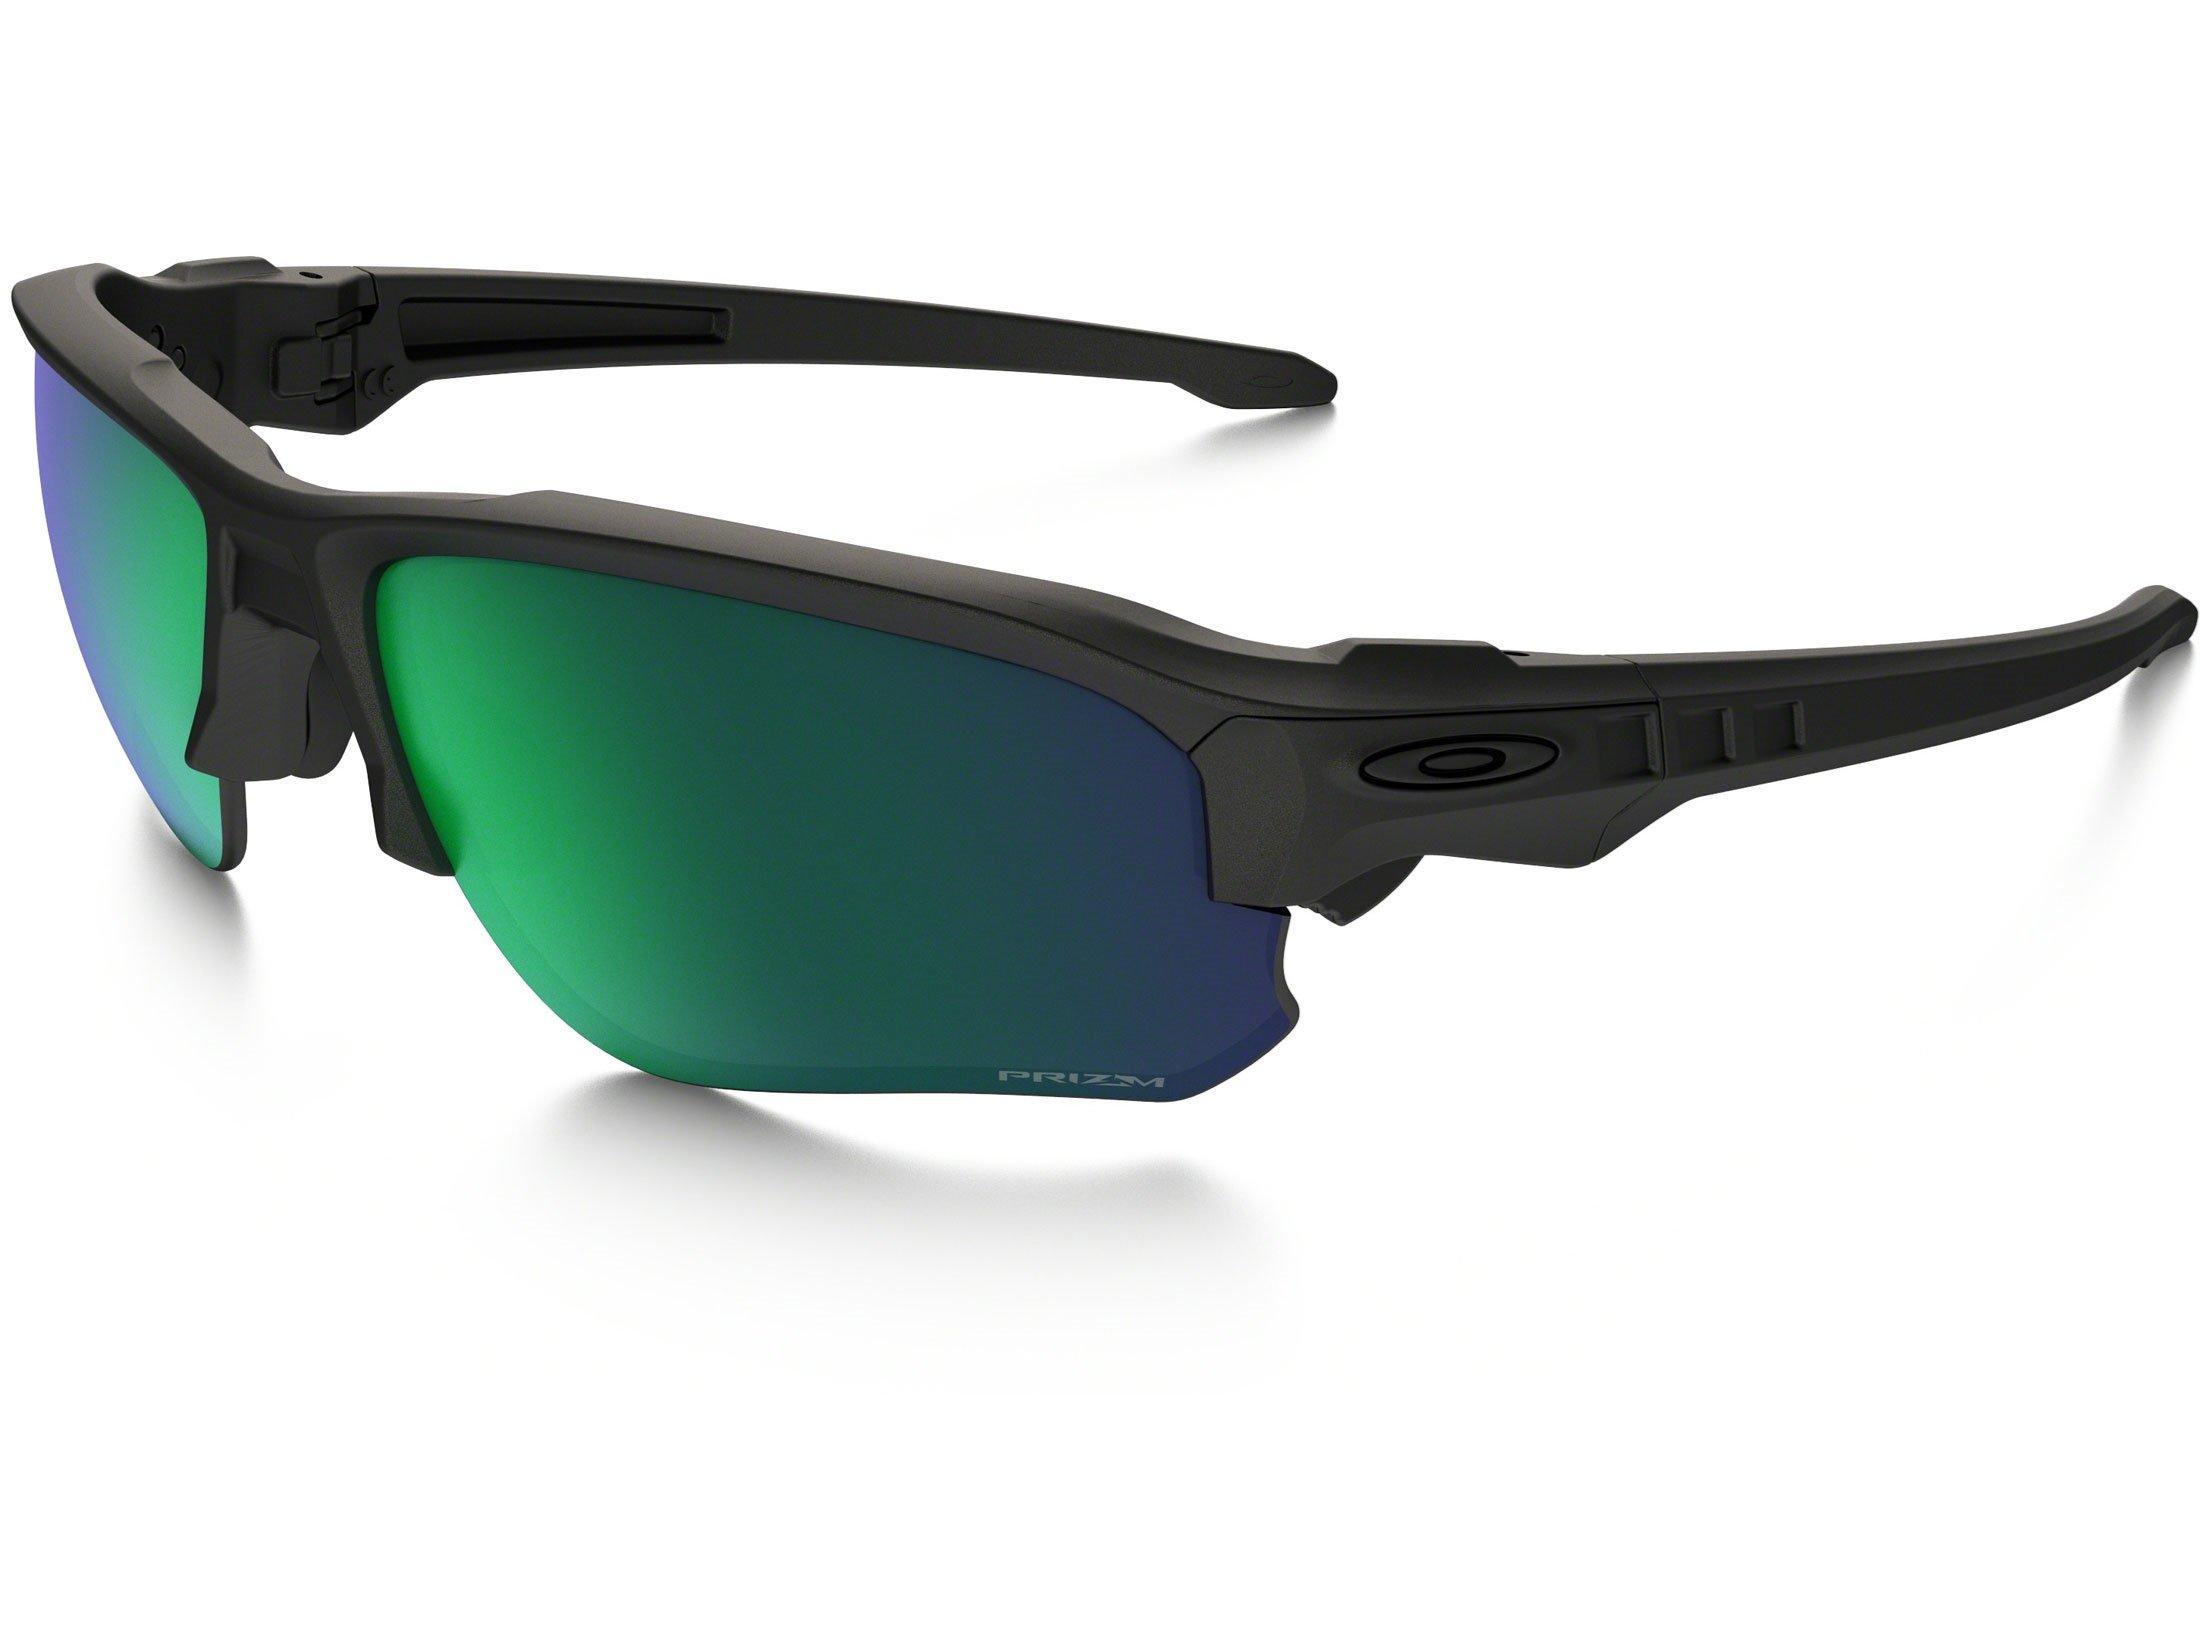 Oakley - Speed Jacket - Matte Black Frame-Prizm Maritime Lenses by Oakley